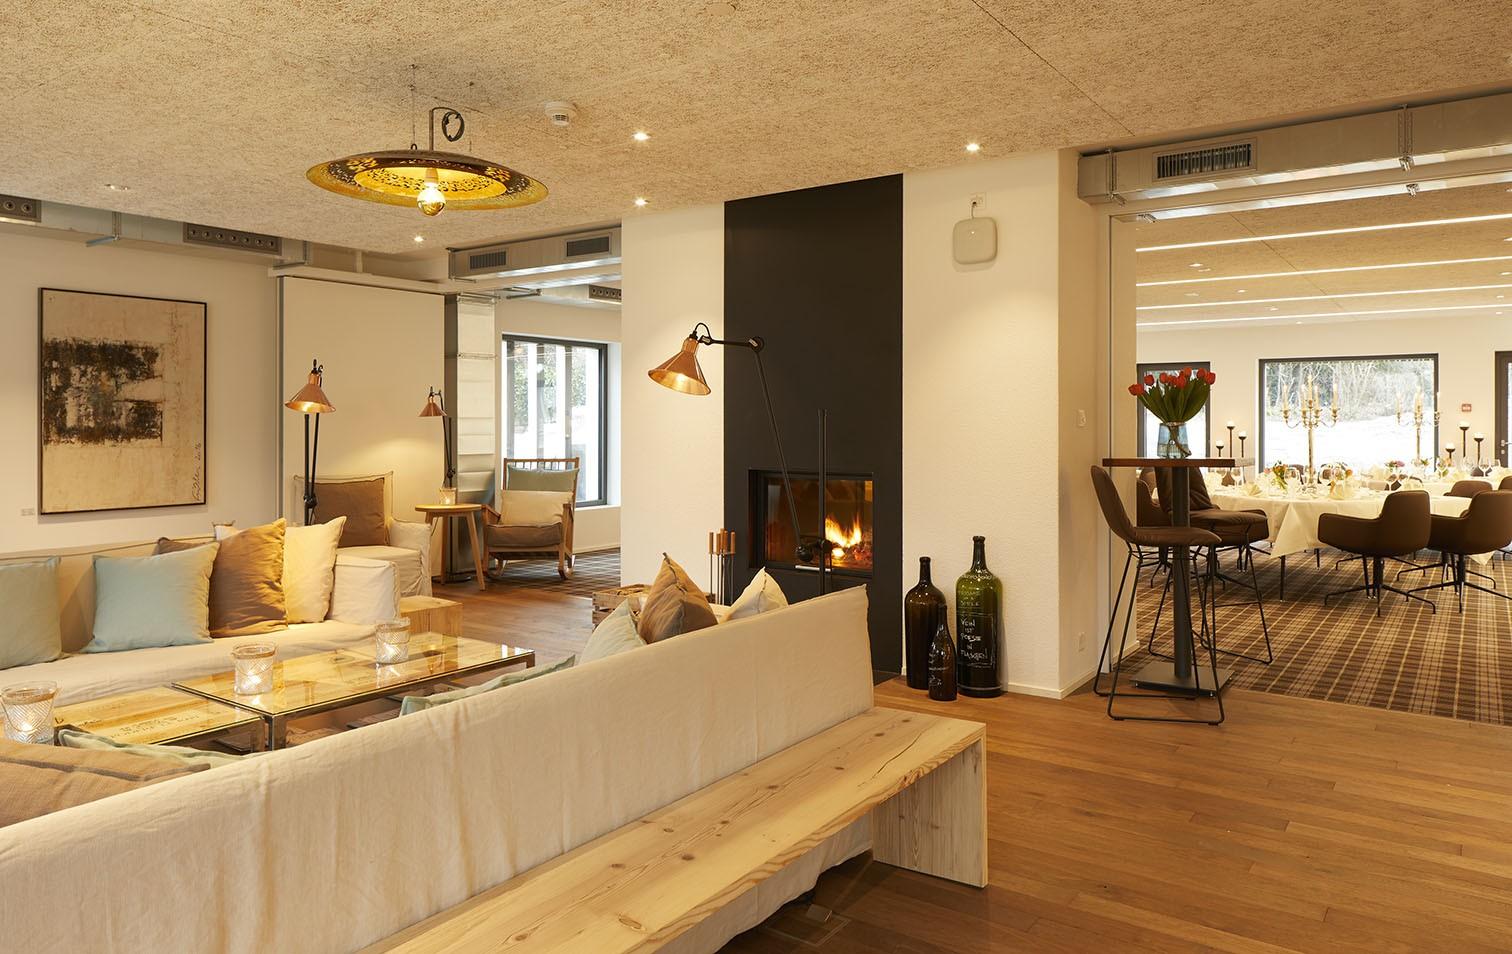 Weinhaus Kamin-Lounge mit Blick ins Denk-Lokal